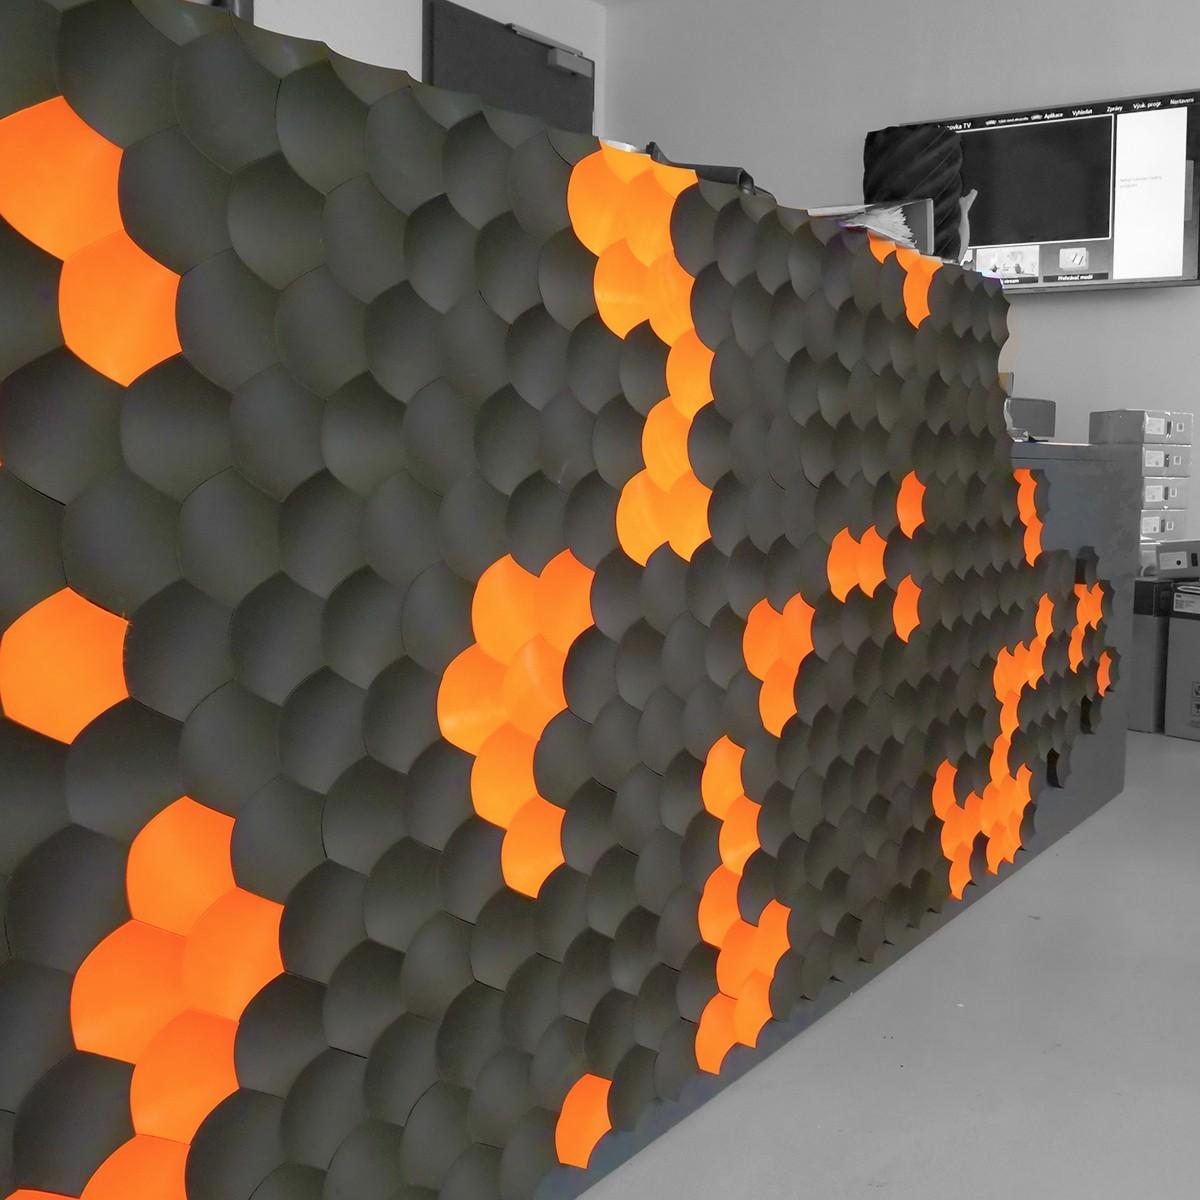 Reception_PrusaLab_Dominik Císar_001.jpg Download free STL file Prusa Reception Tiles - PrusaLab • 3D print model, cisardom